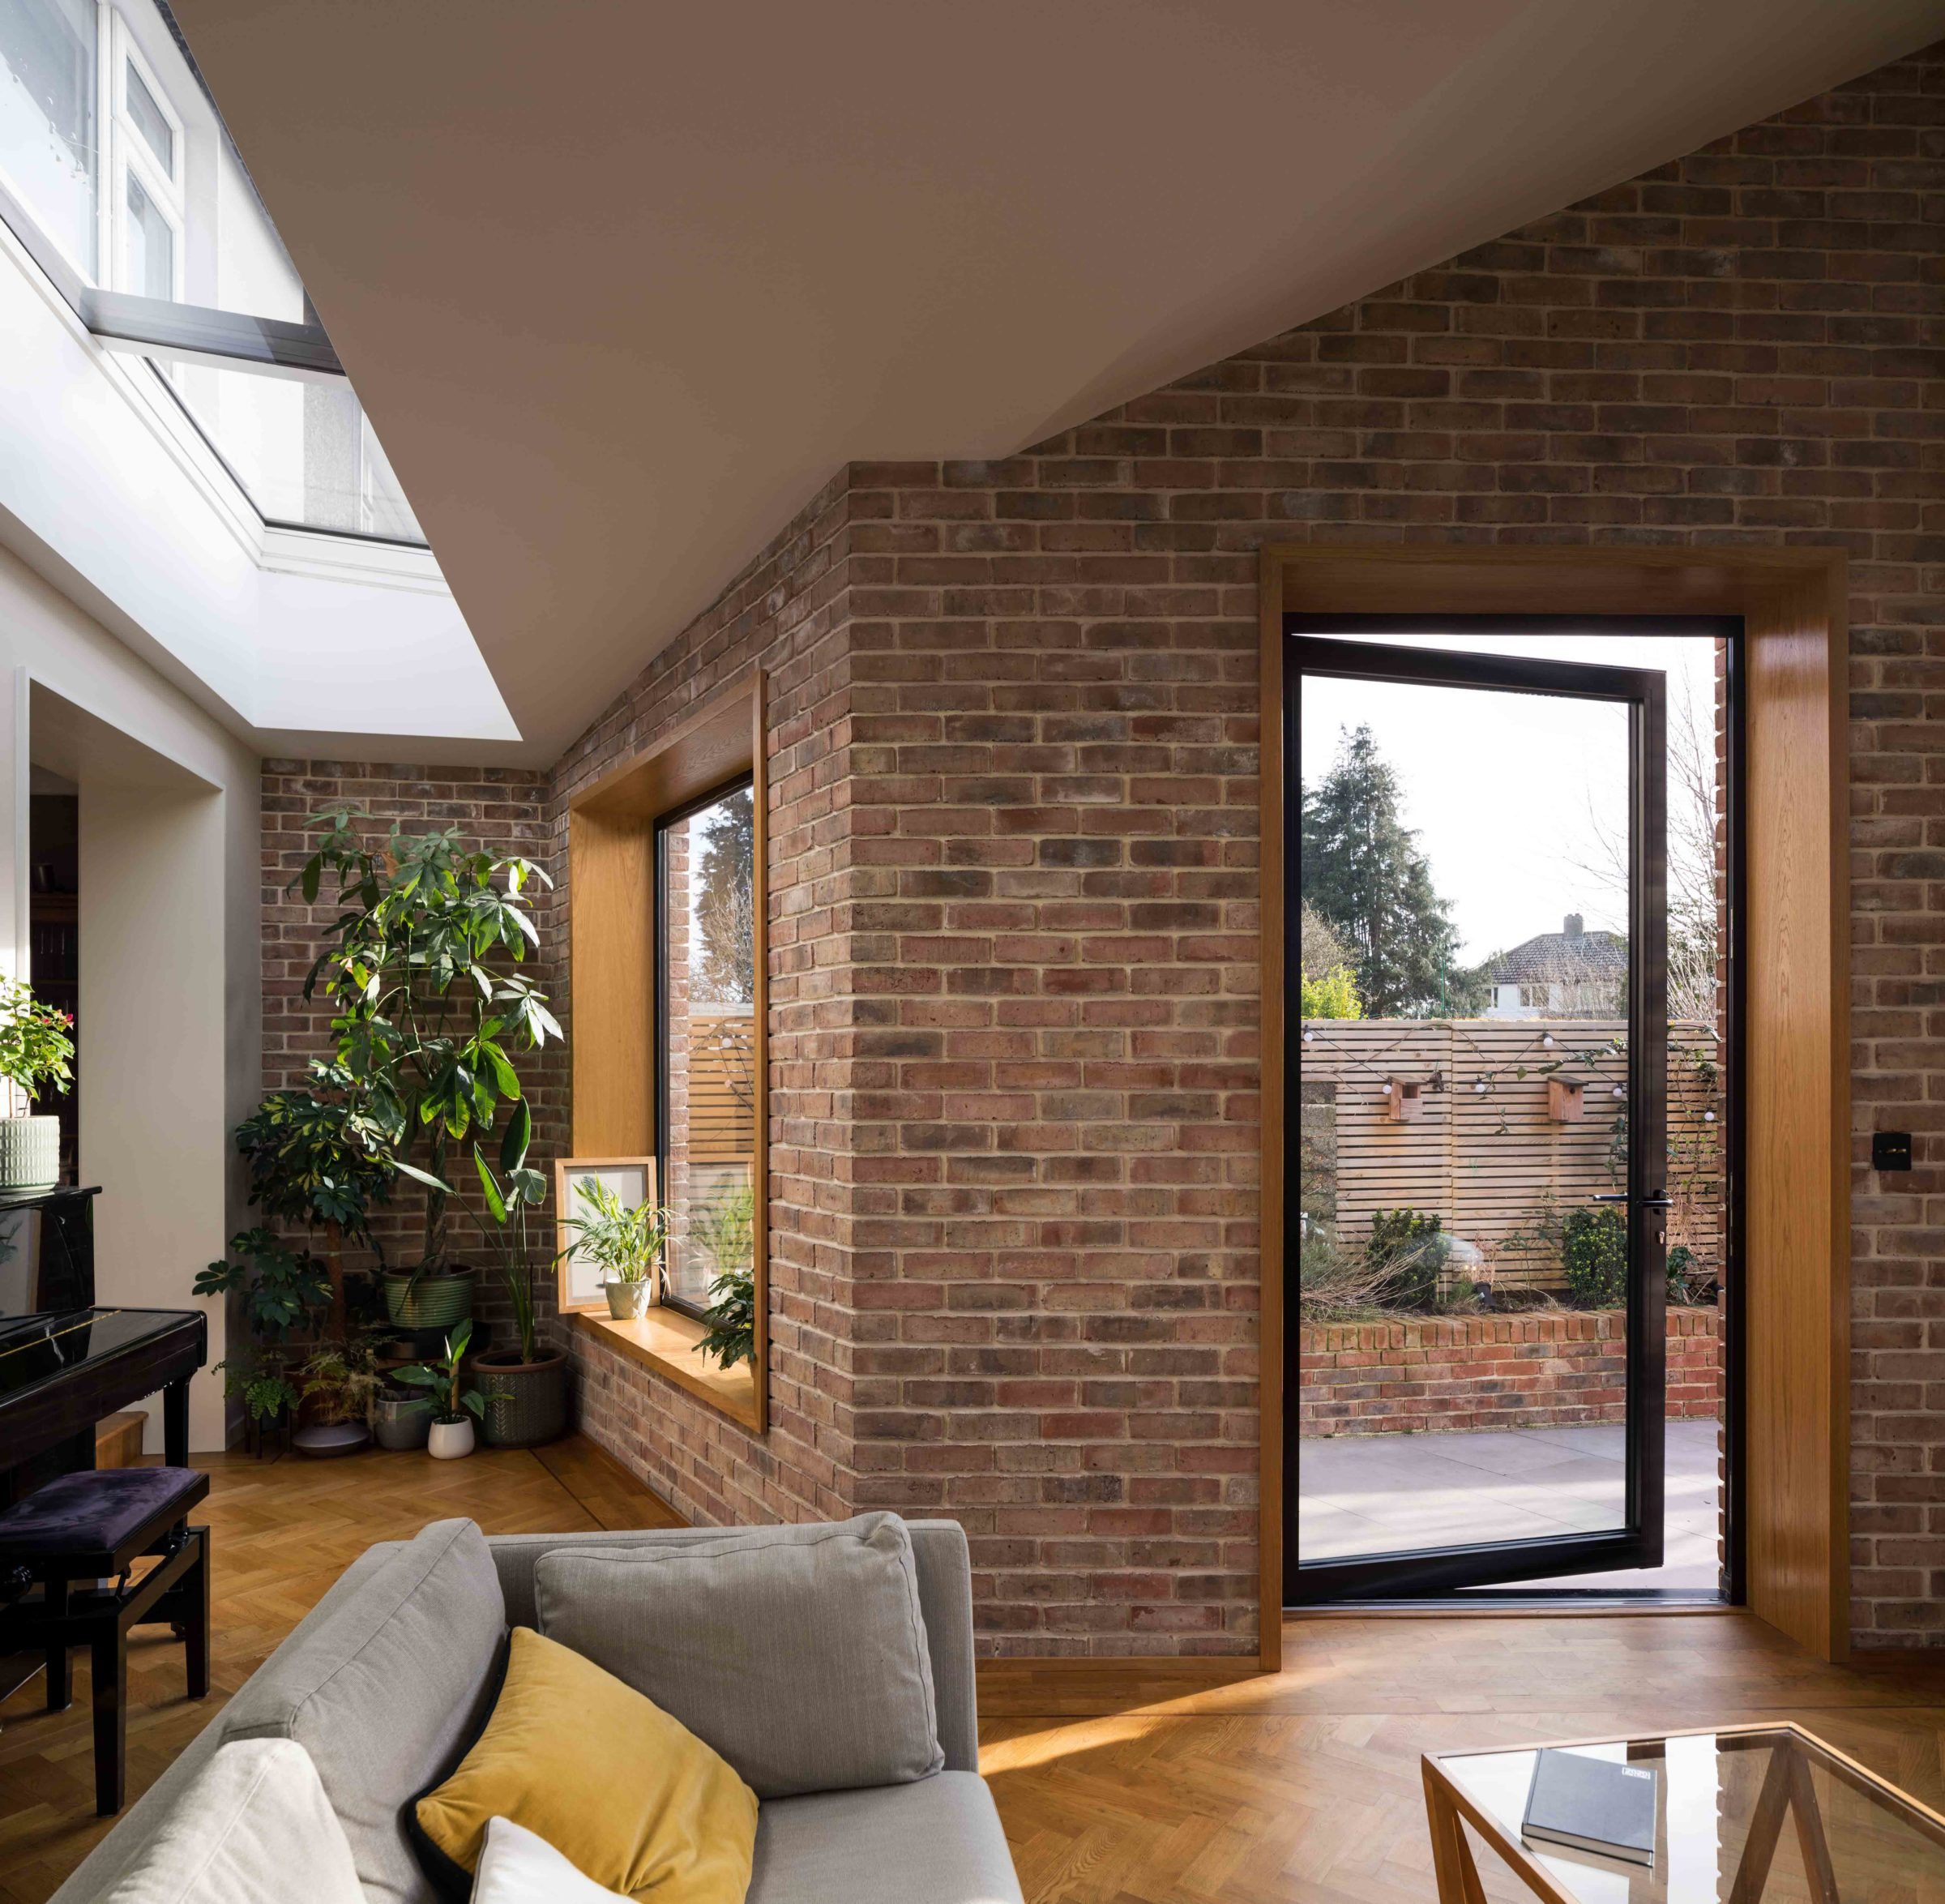 Architectural Farm_Garden Room (7) Andrew Campion